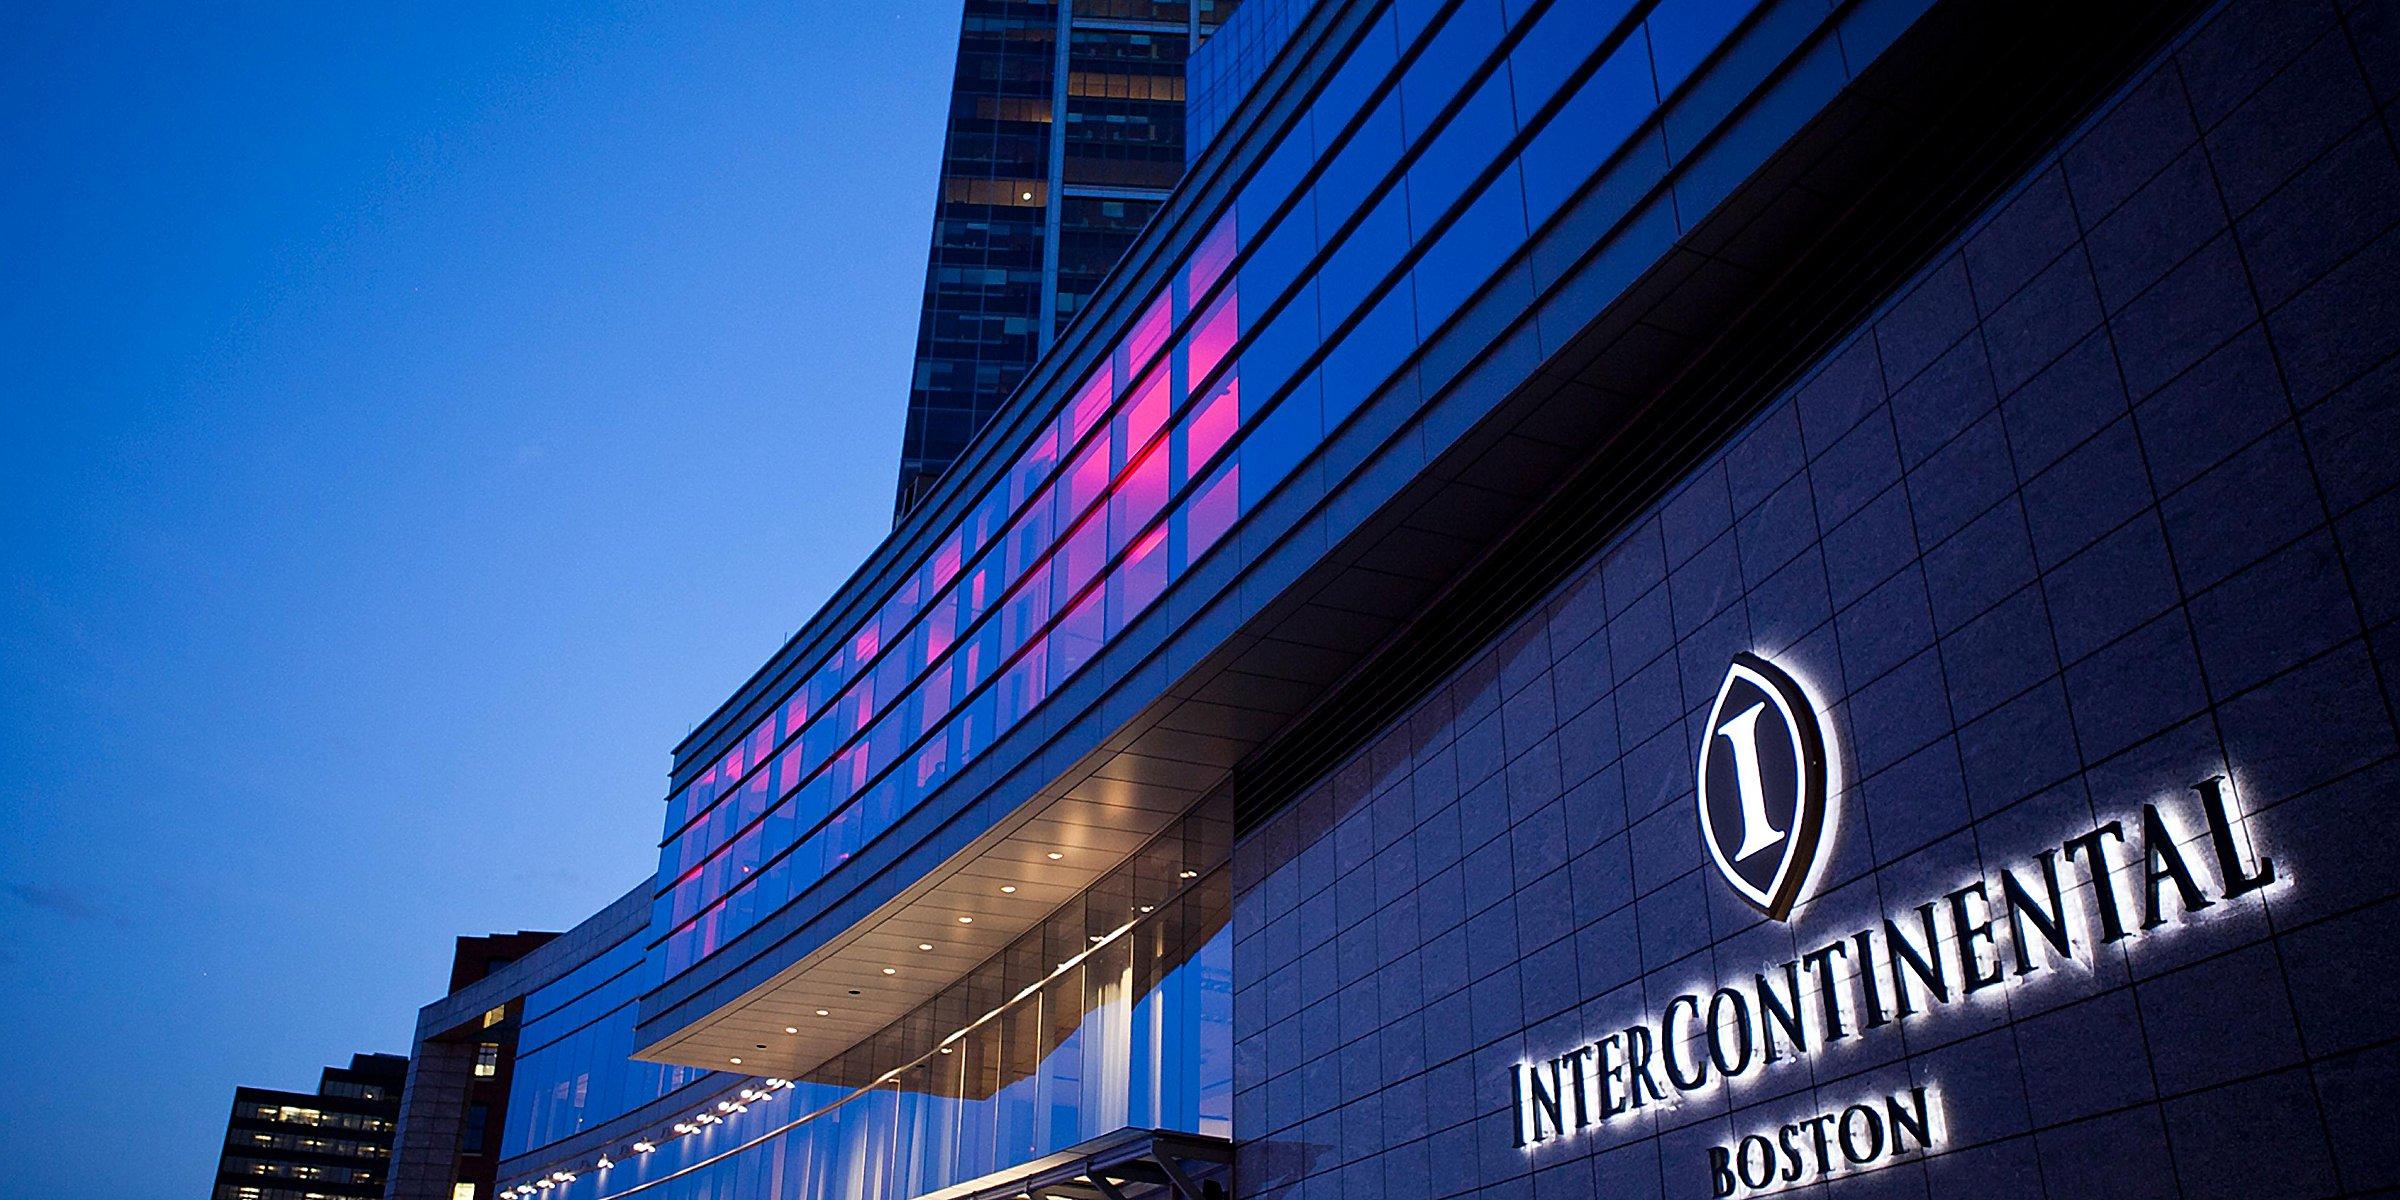 Downtown Boston Luxury Hotels Near Airport